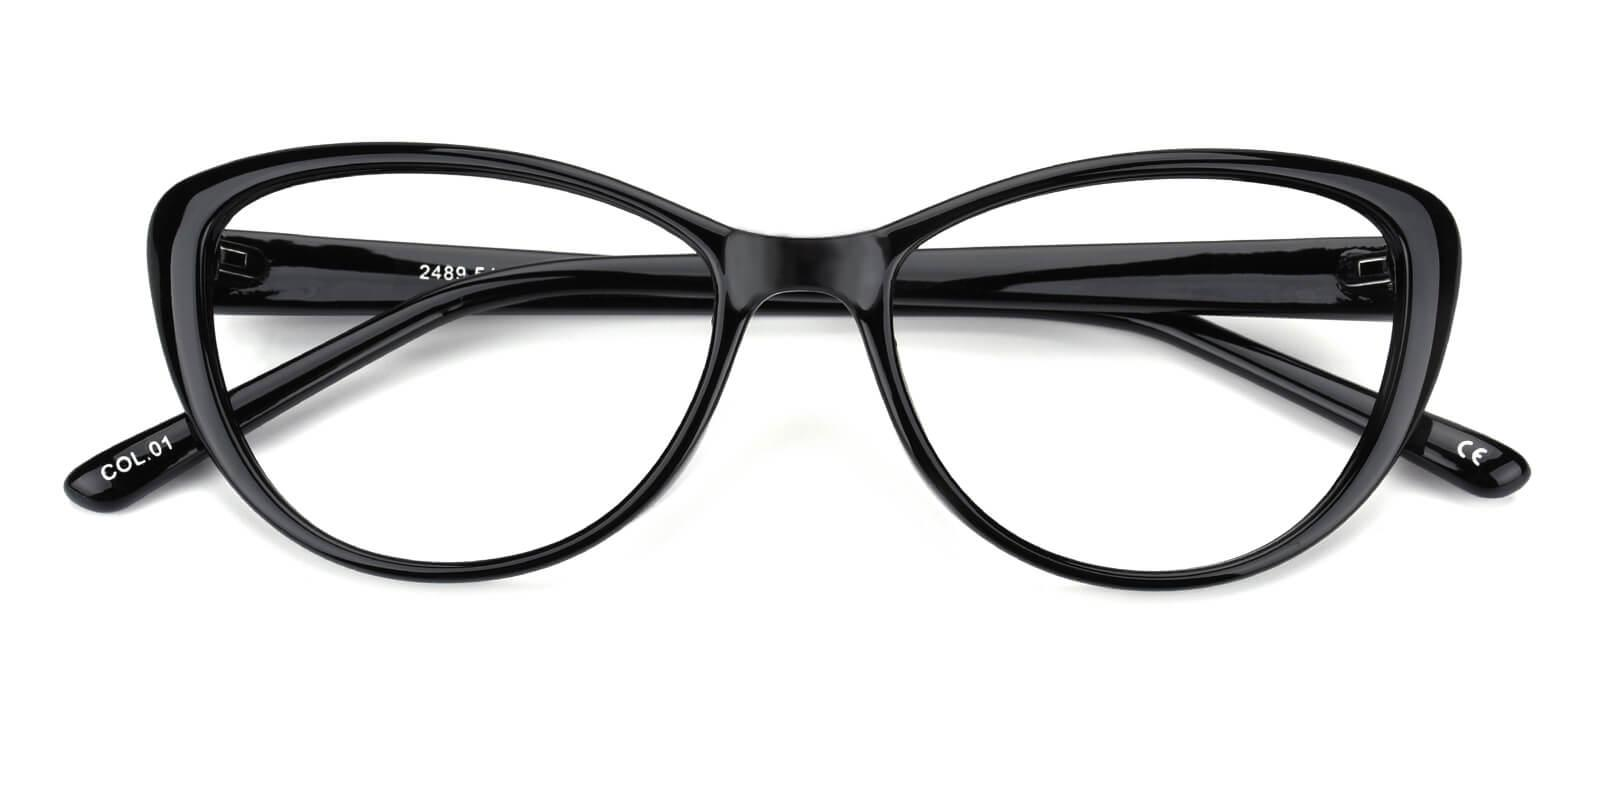 Slackey-Black-Oval / Cat-Acetate-Eyeglasses-detail